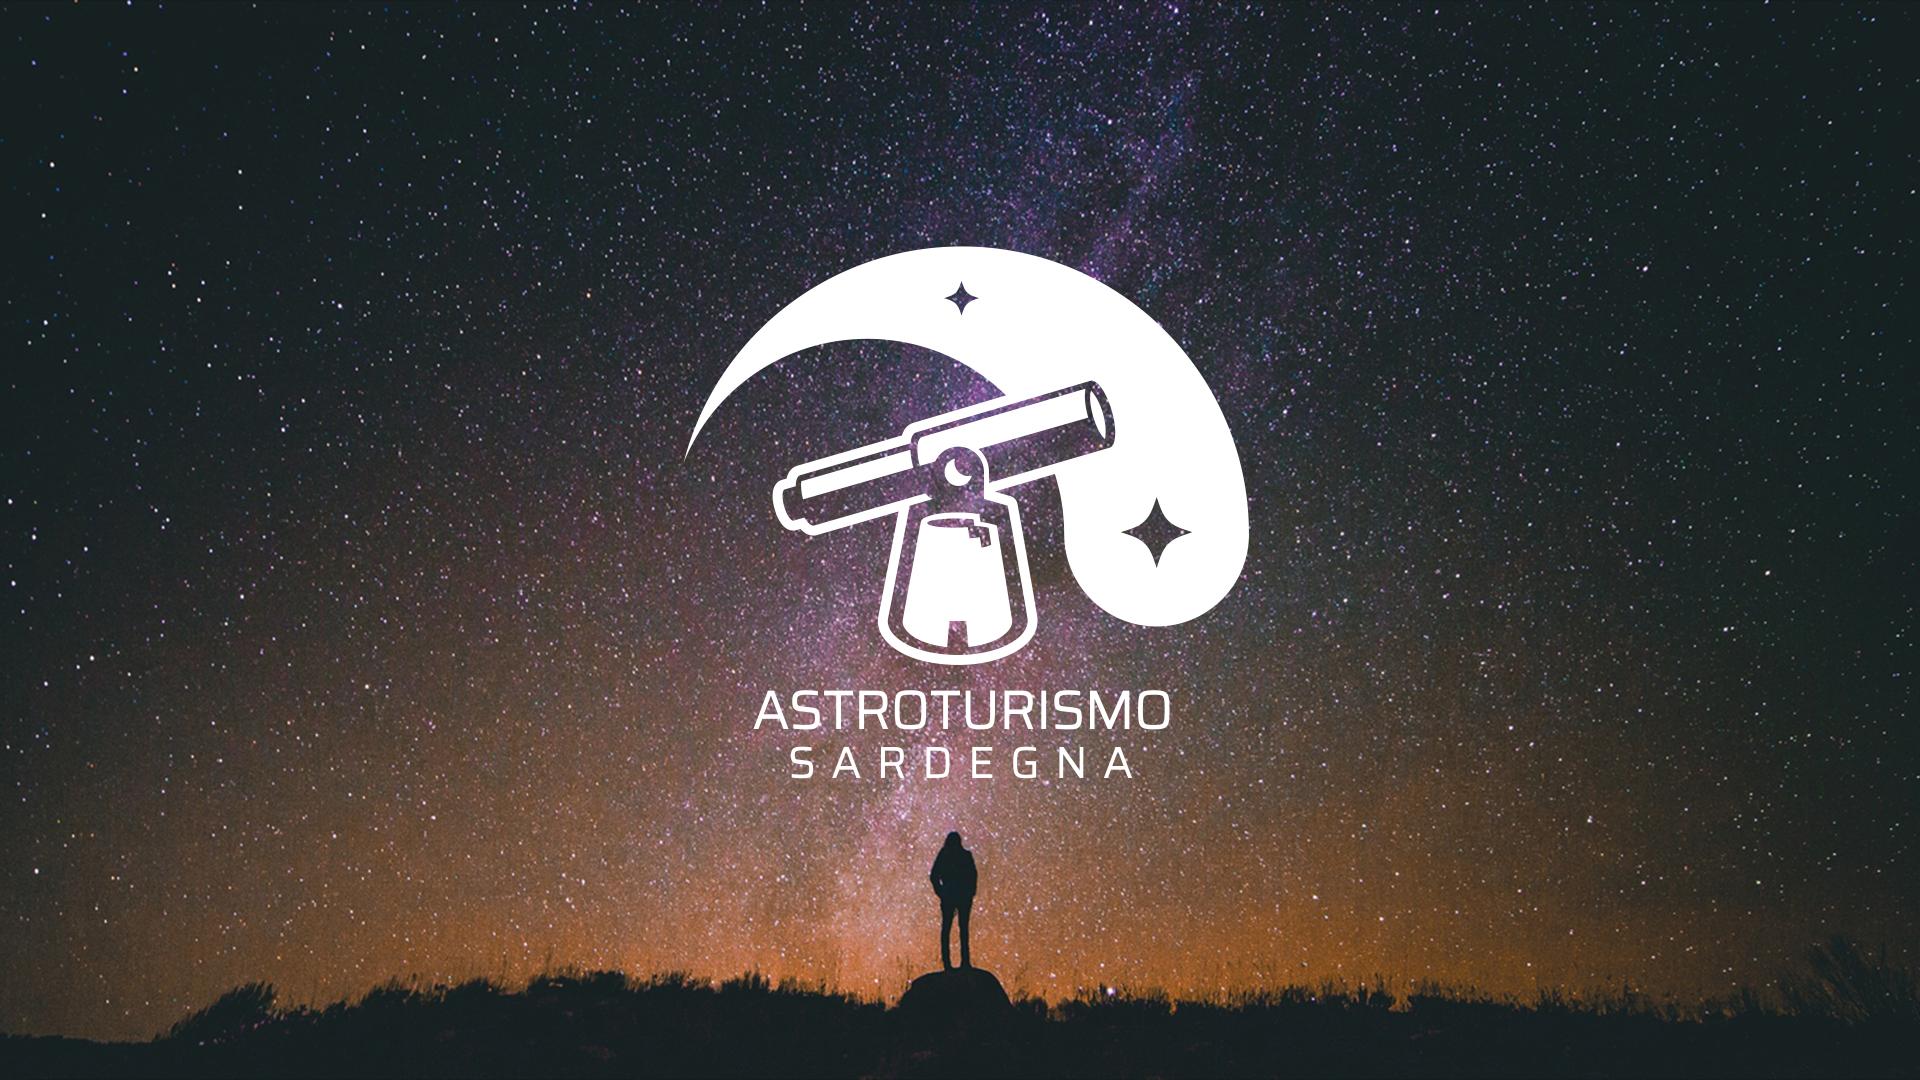 astroturismosardegna